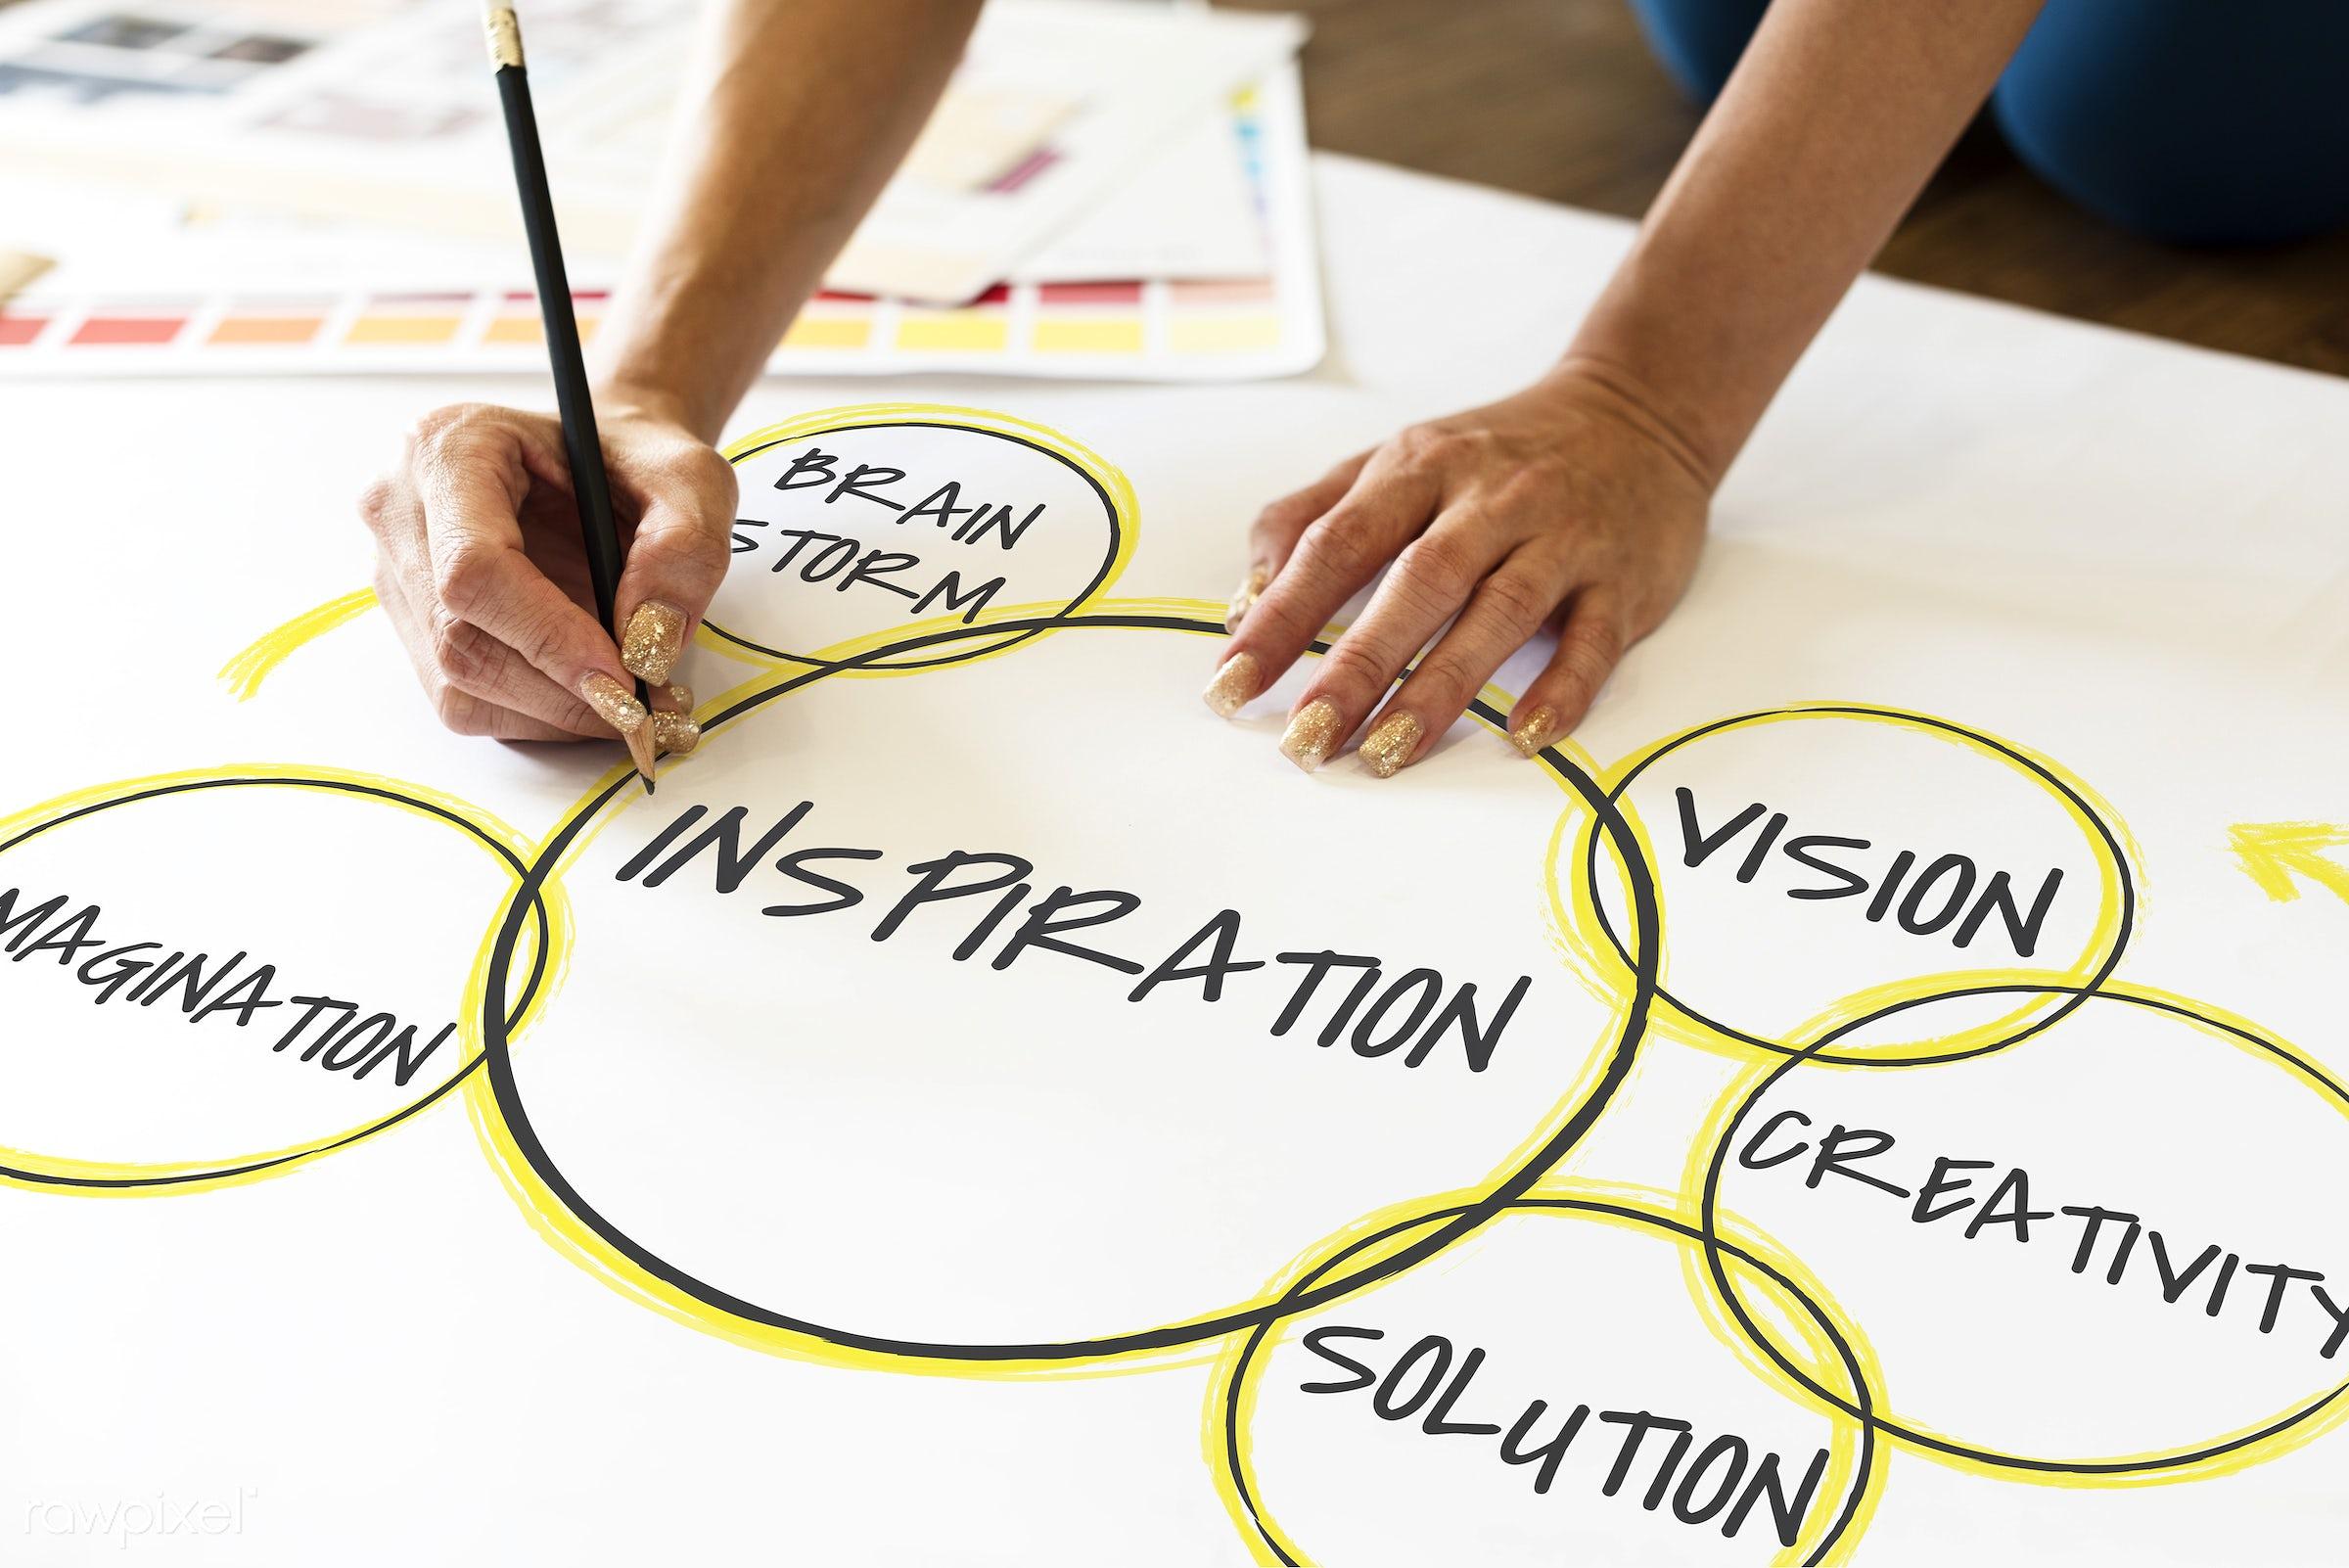 writing, art, brainstorm, business, creation, creative, creativity, design, development, diagram, drawing, entrepreneur,...